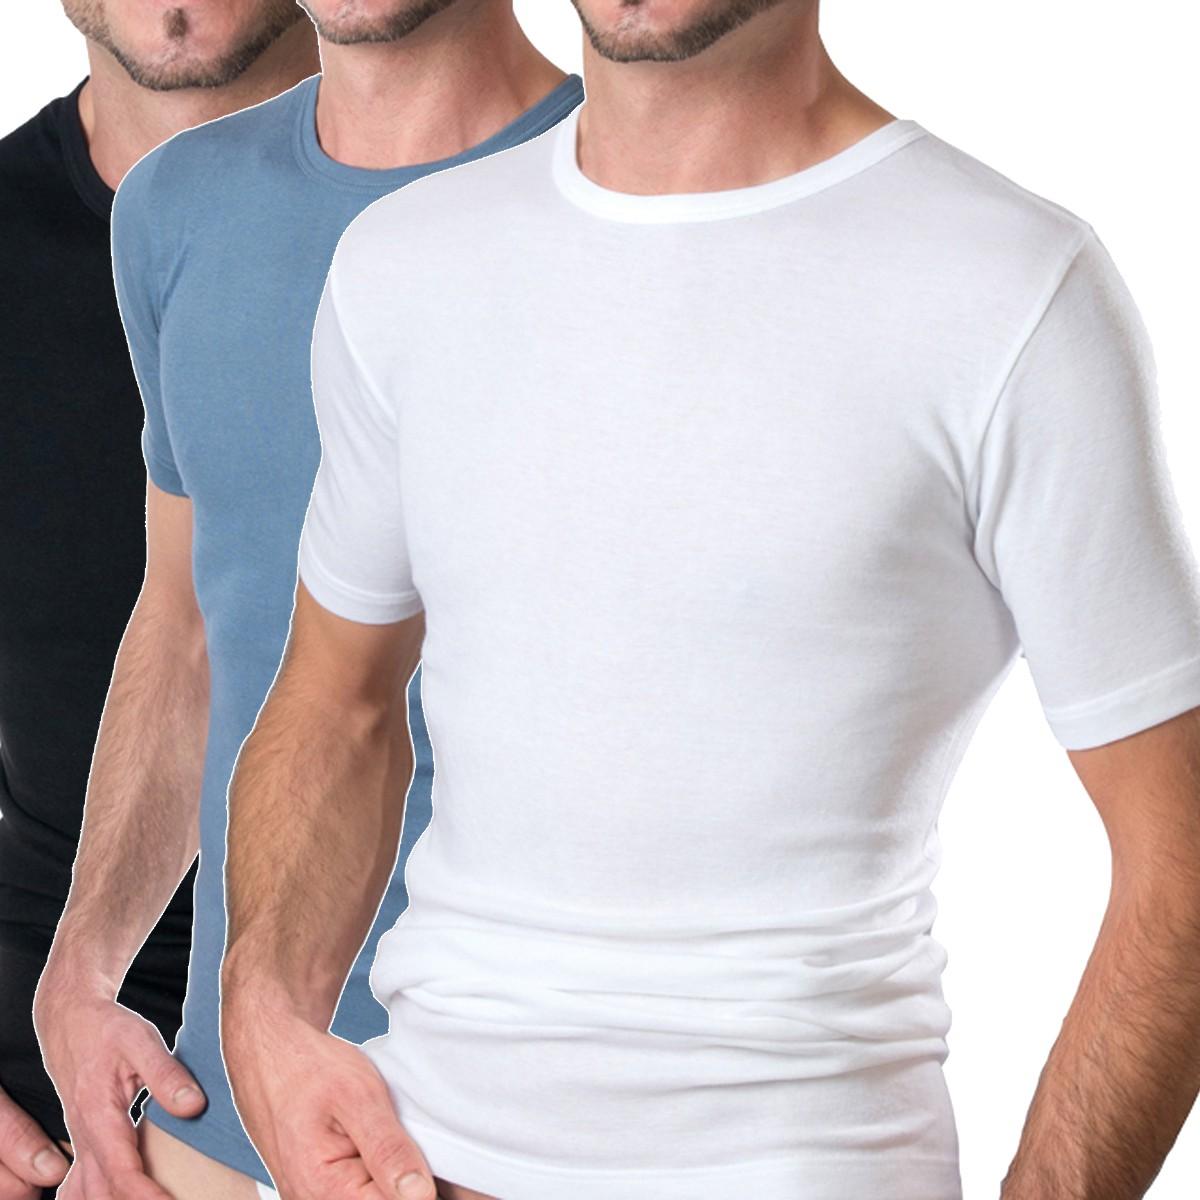 HERMKO 20 Herren kurzarm Shirt, Rundhals